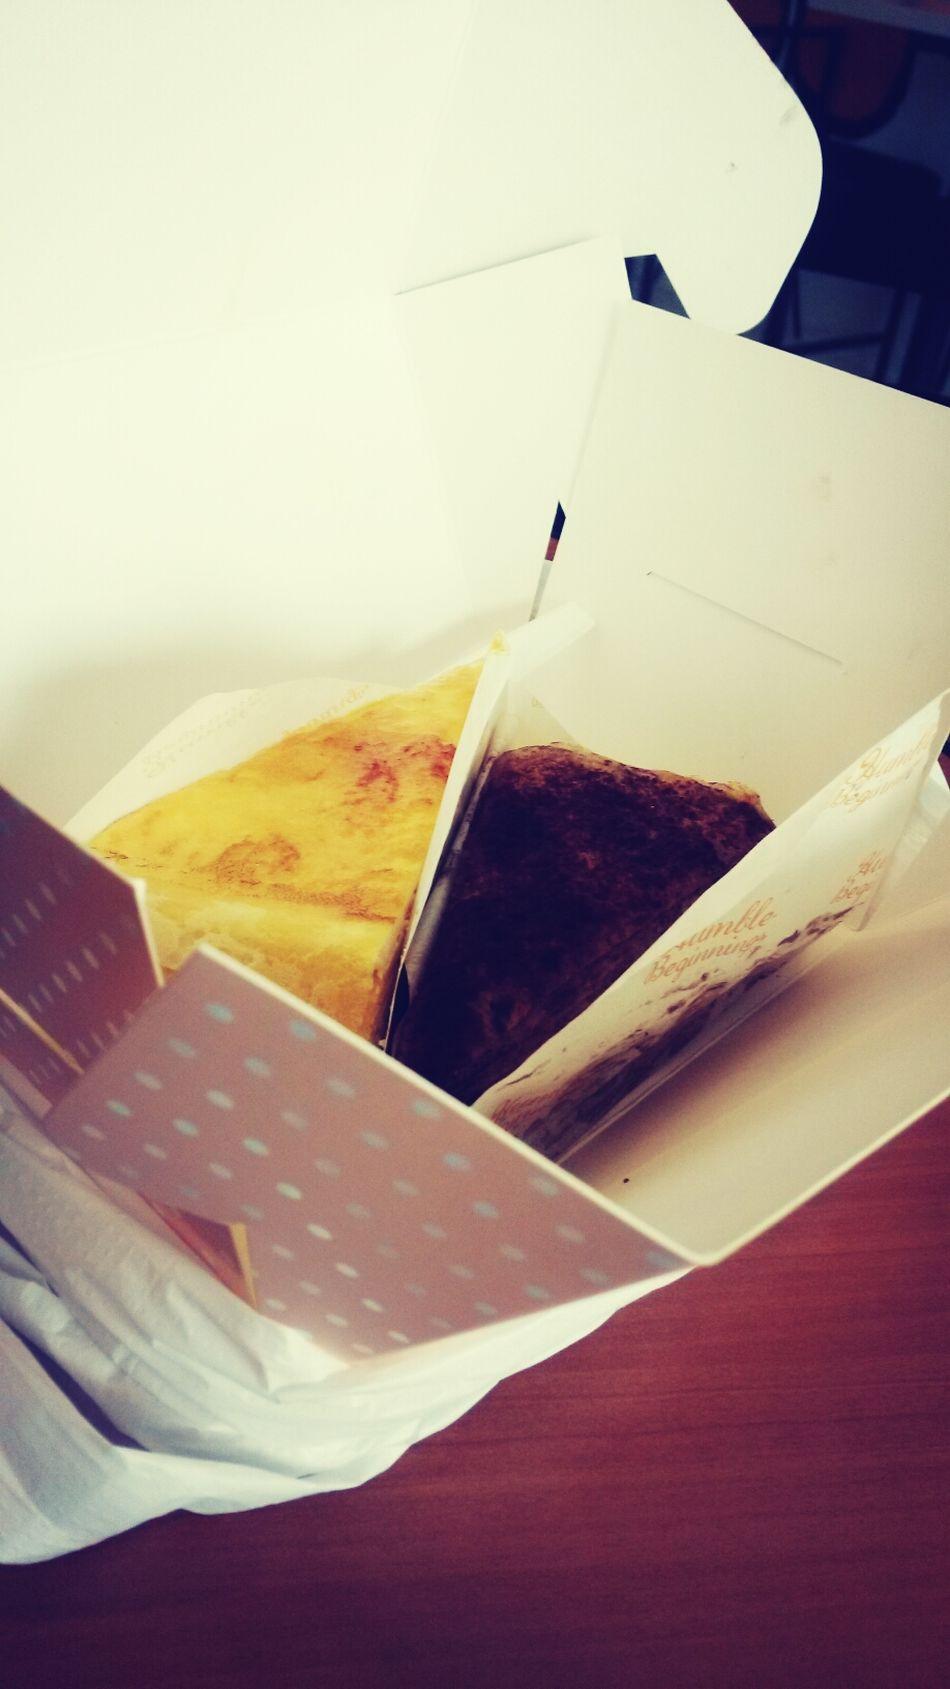 we having this Cakes Yummeyyh! at humble beginnings.so attempt us at lunch..nak lagii =..=' @lianalockas